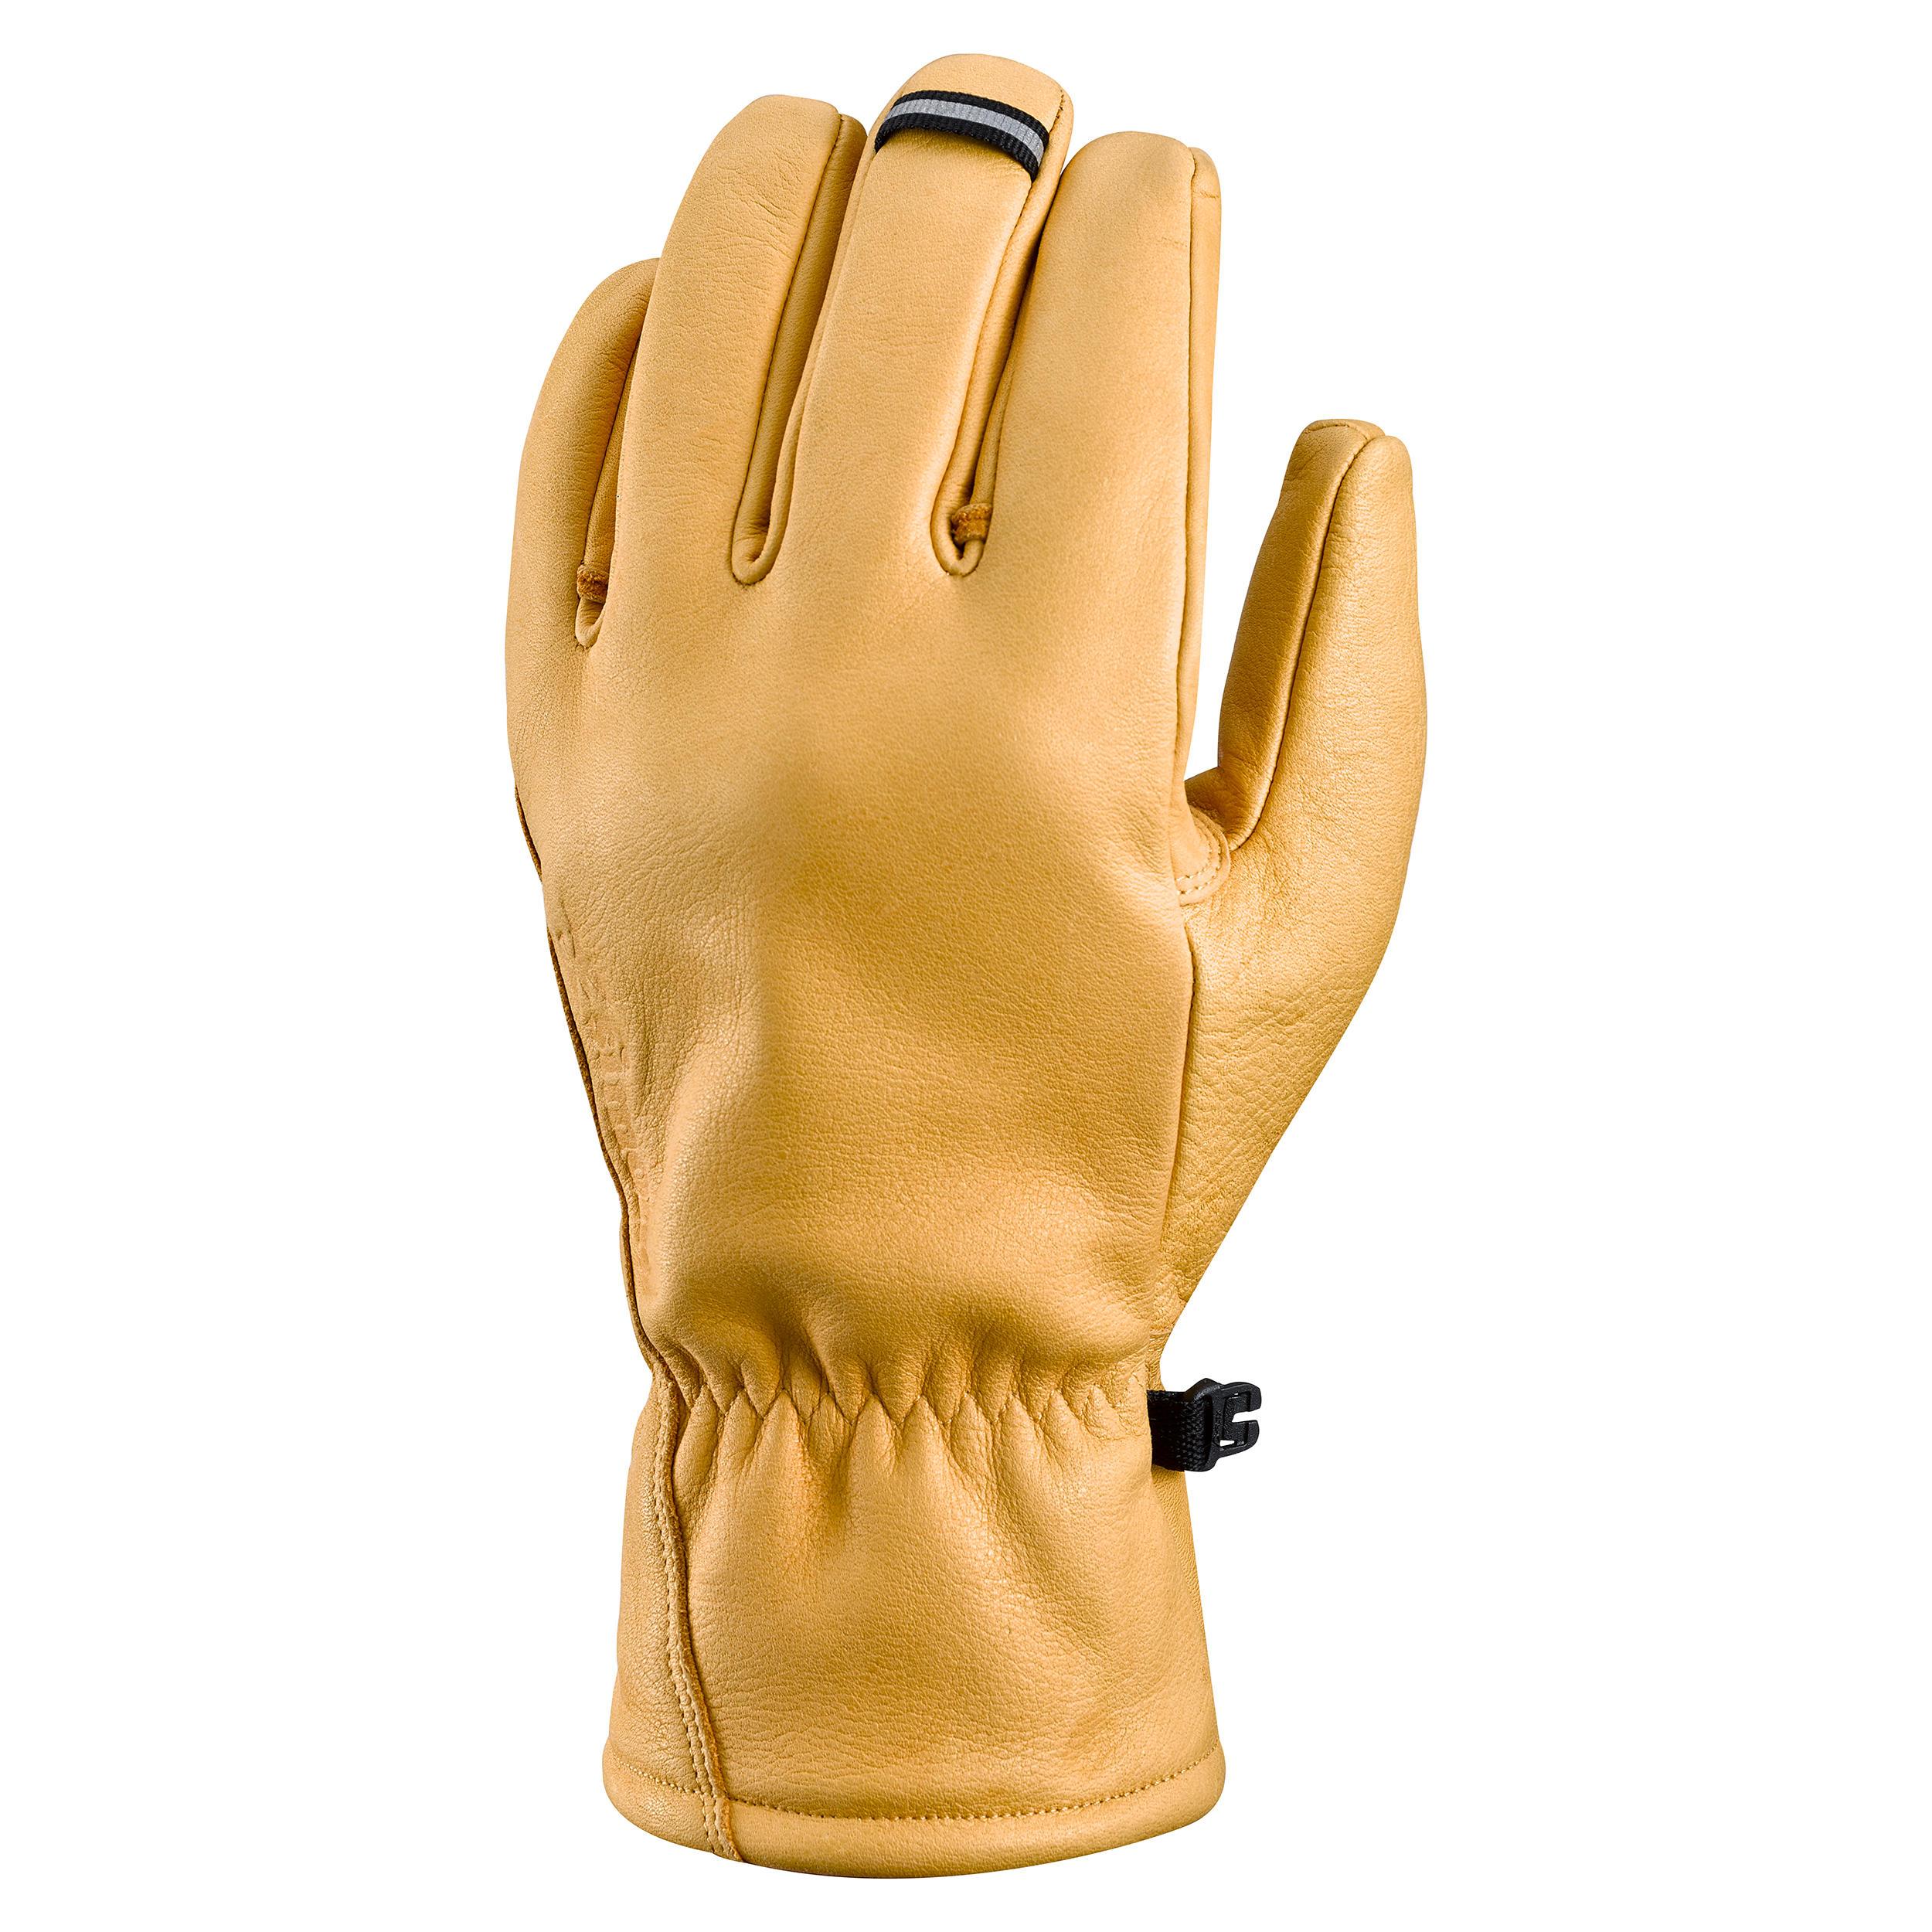 Bergsteiger-Handschuhe ALPINISM Leder | Accessoires > Handschuhe > Lederhandschuhe | Simond